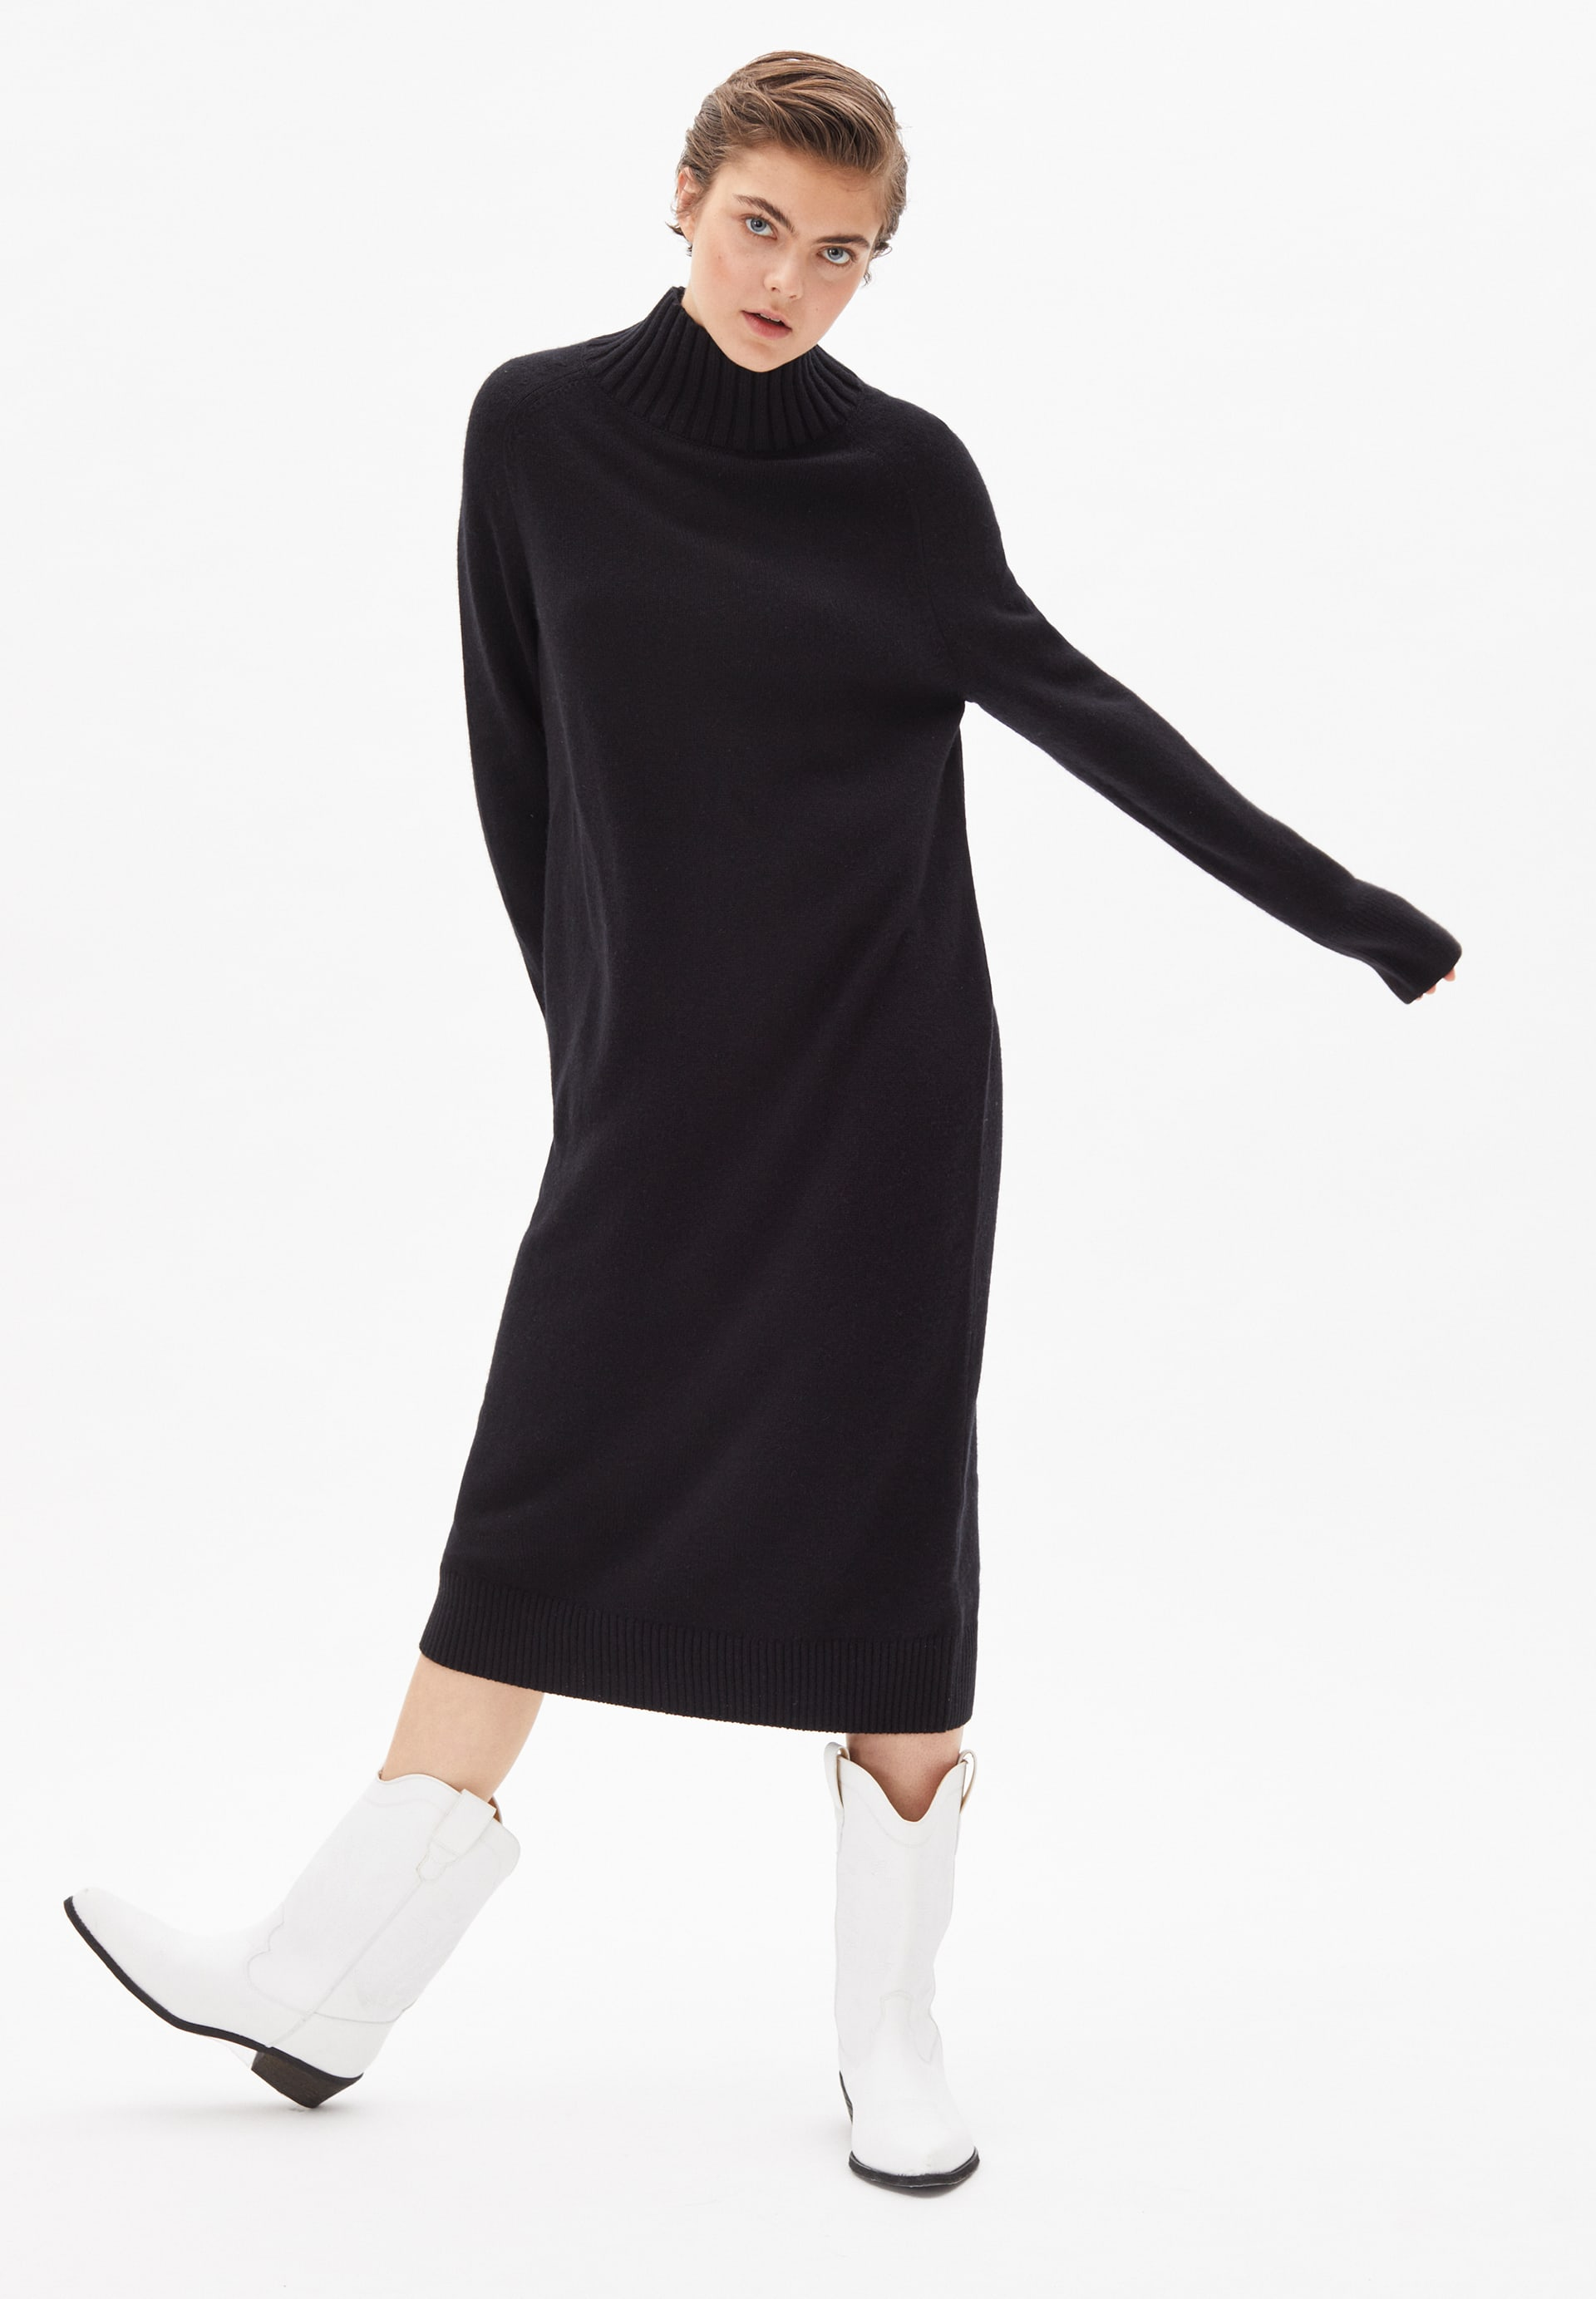 KERAA Knit Dress made of Organic Wool Mix